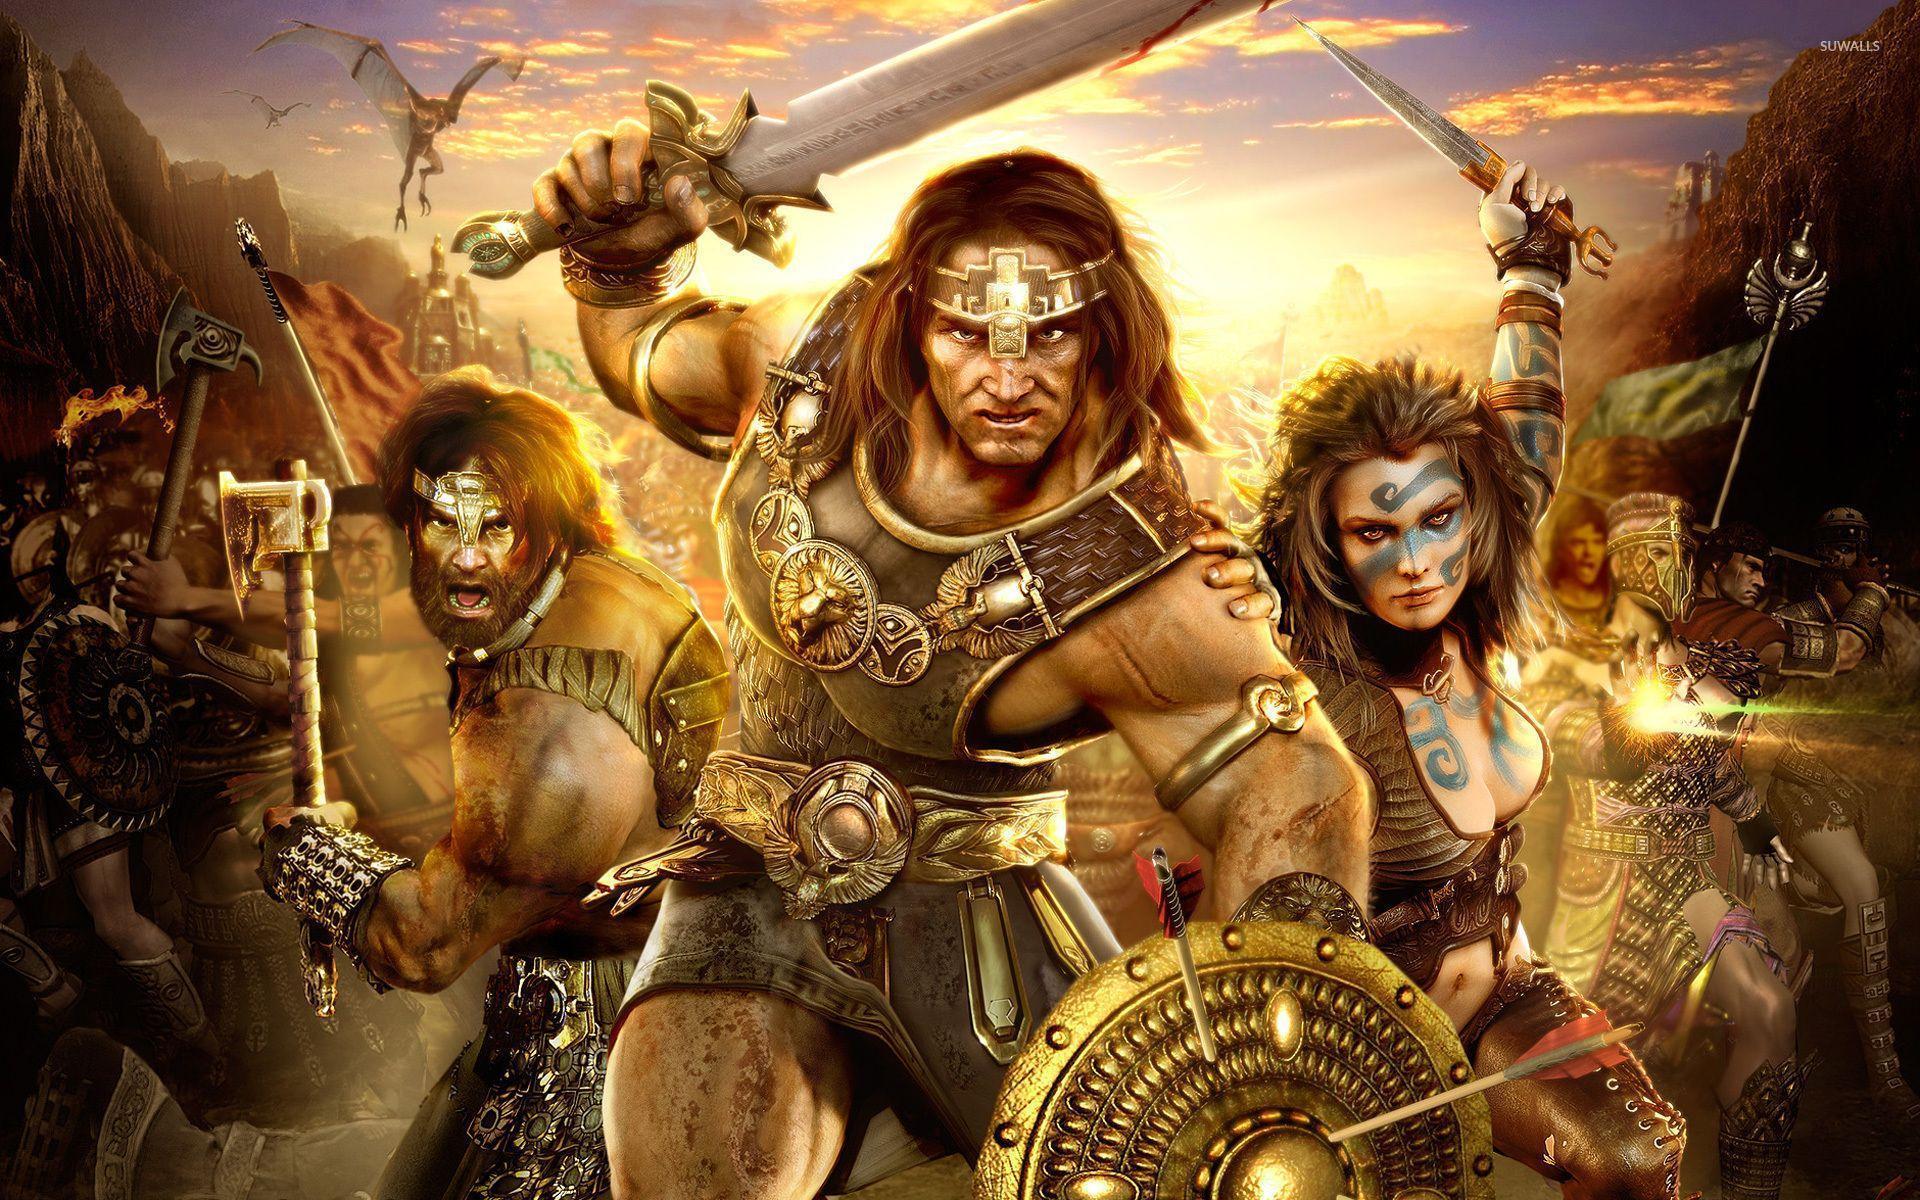 Age Of Conan: Hyborian Adventures wallpaper - Game wallpapers - #4705